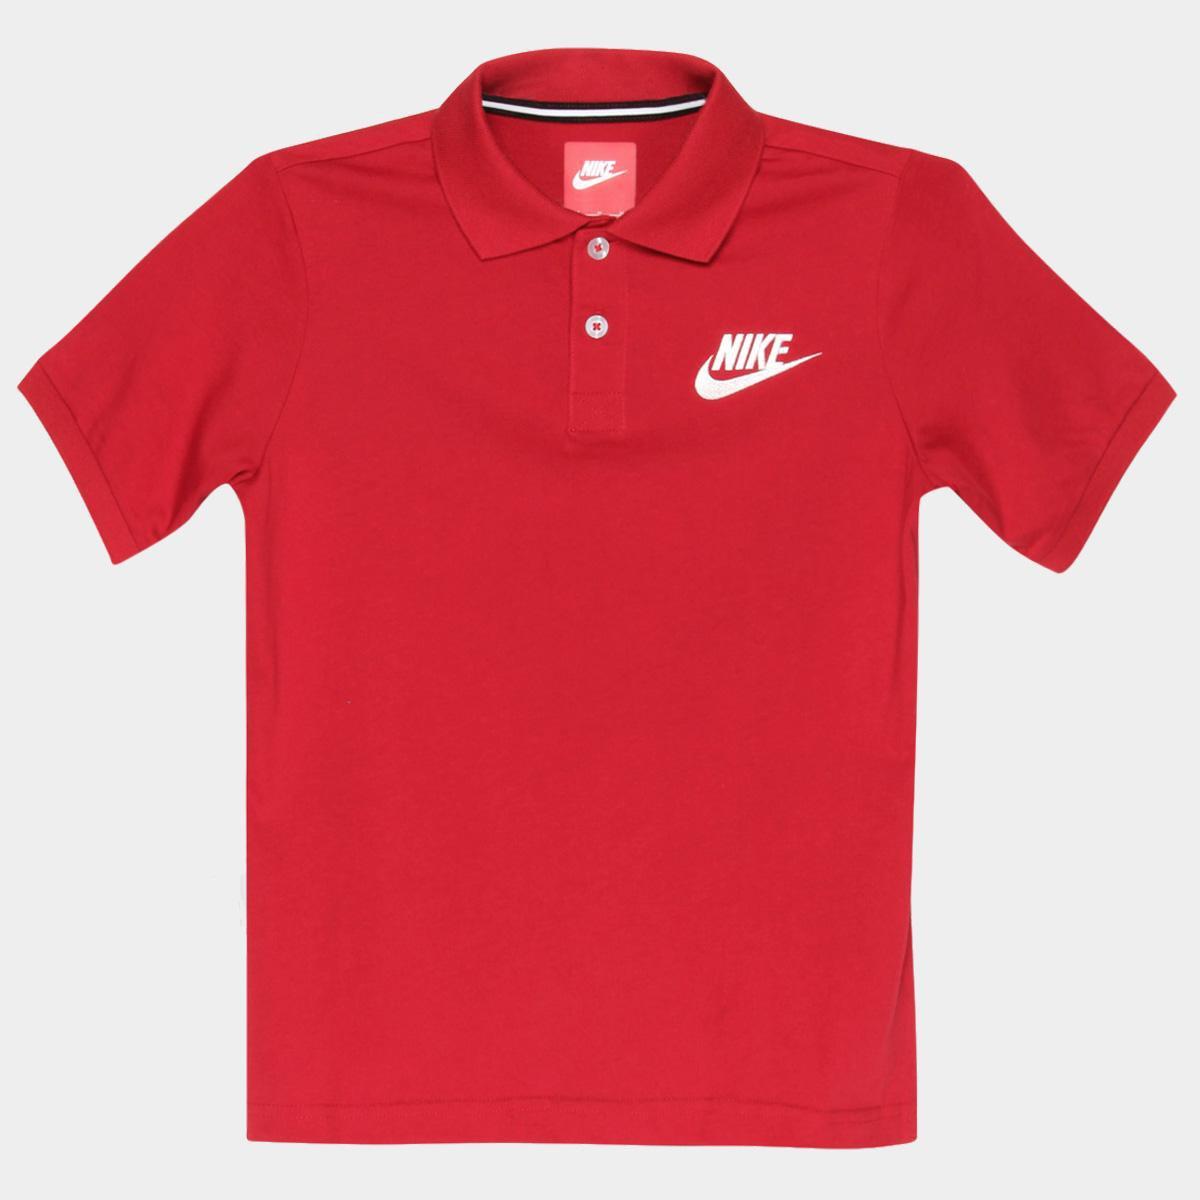 16d0a6221b9b6 Camisa Polo Nike Franchise Infantil - Compre Agora